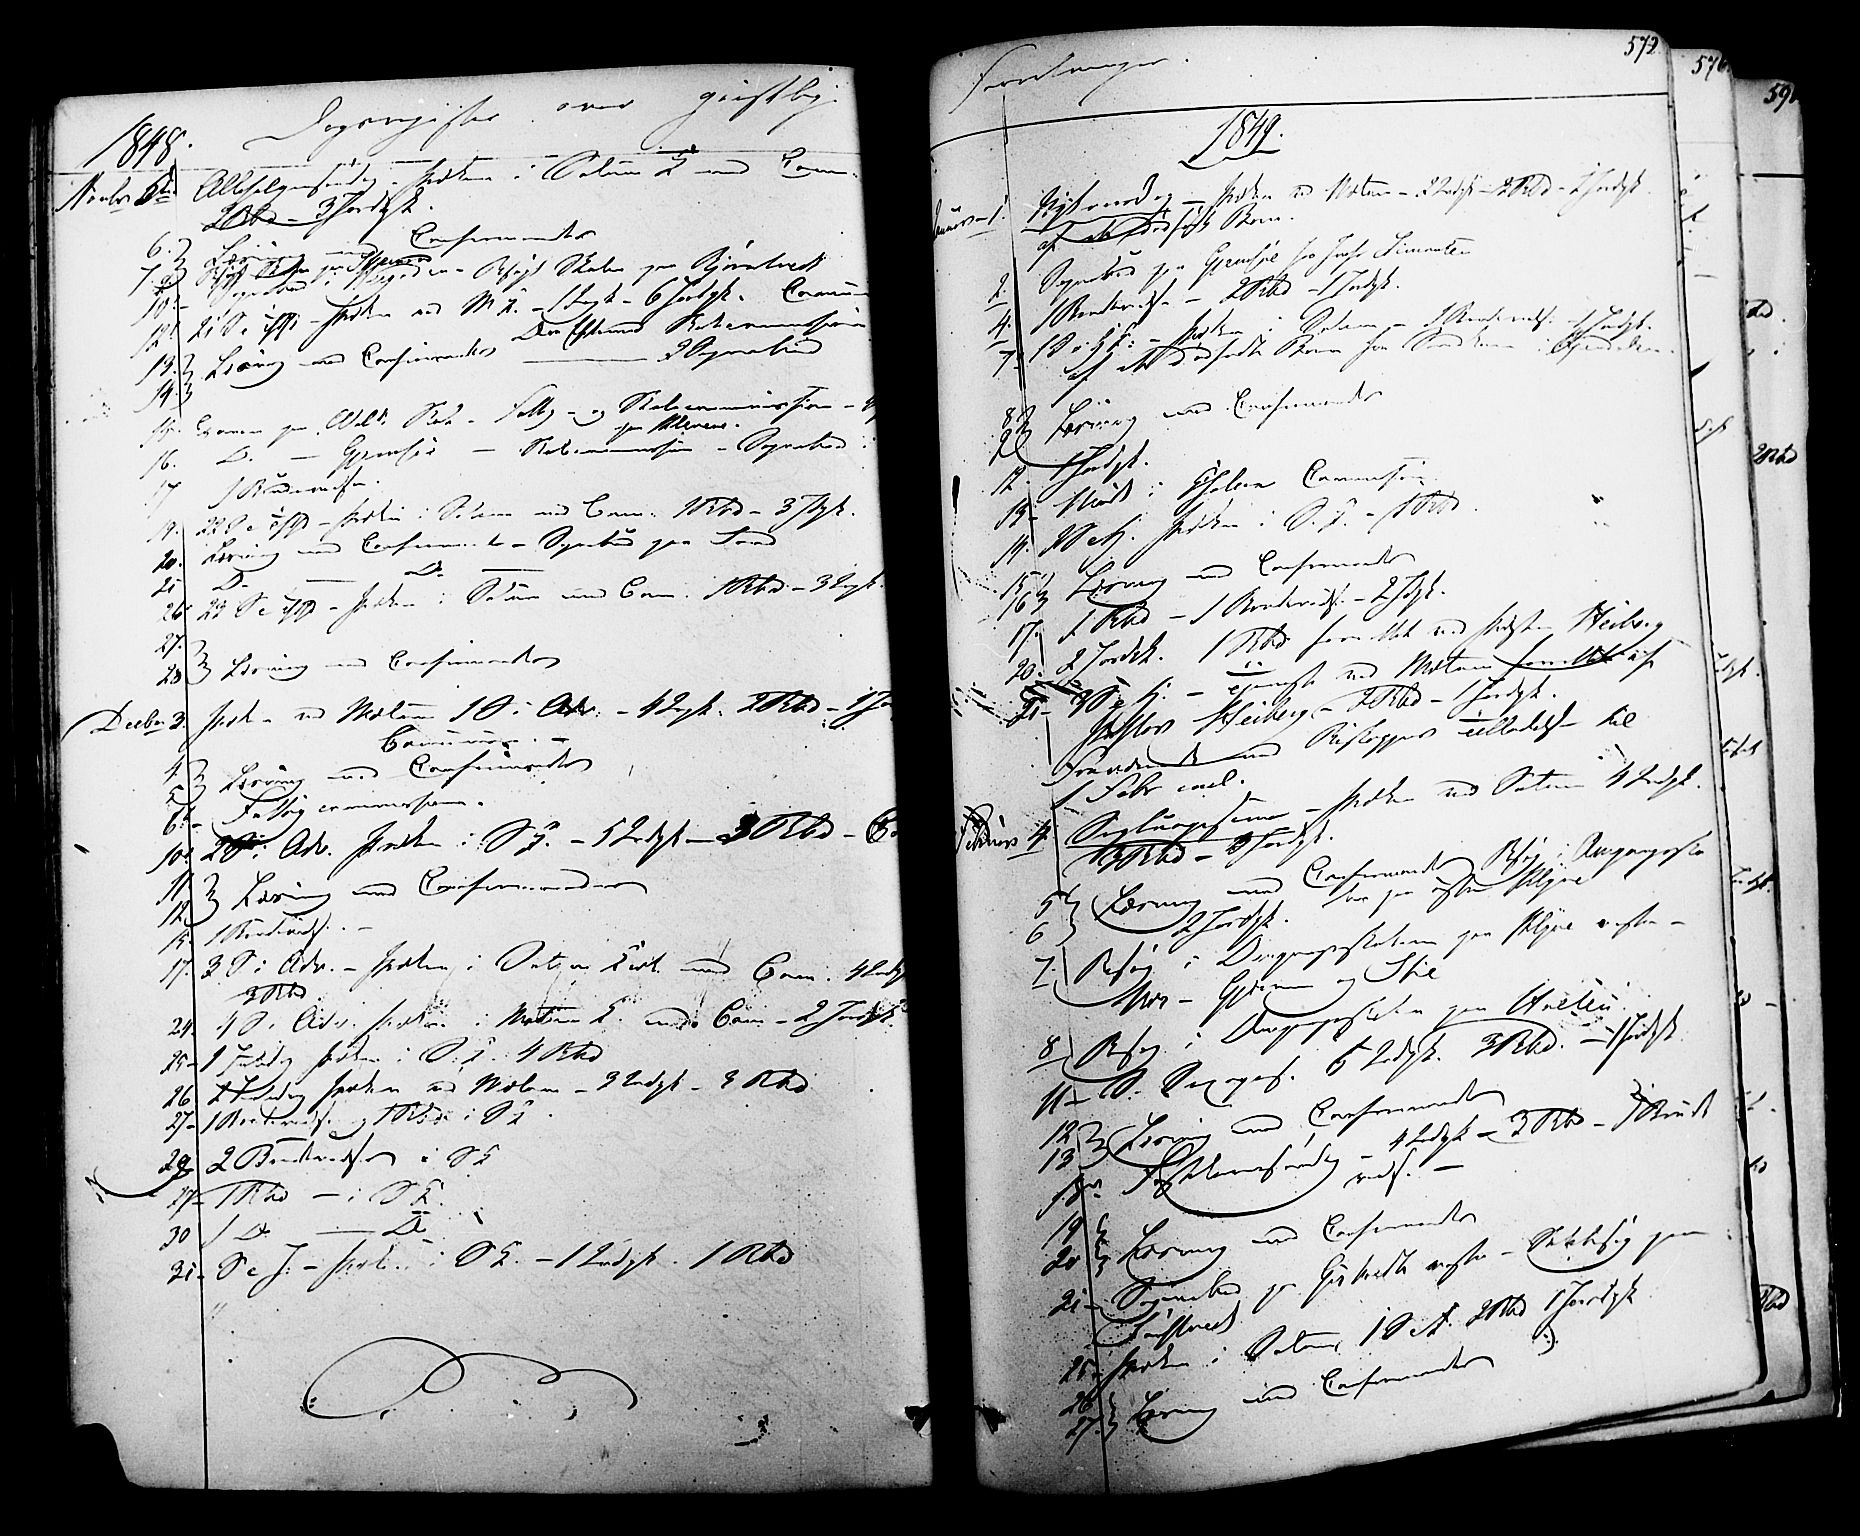 SAKO, Solum kirkebøker, F/Fa/L0006: Ministerialbok nr. I 6, 1844-1855, s. 572